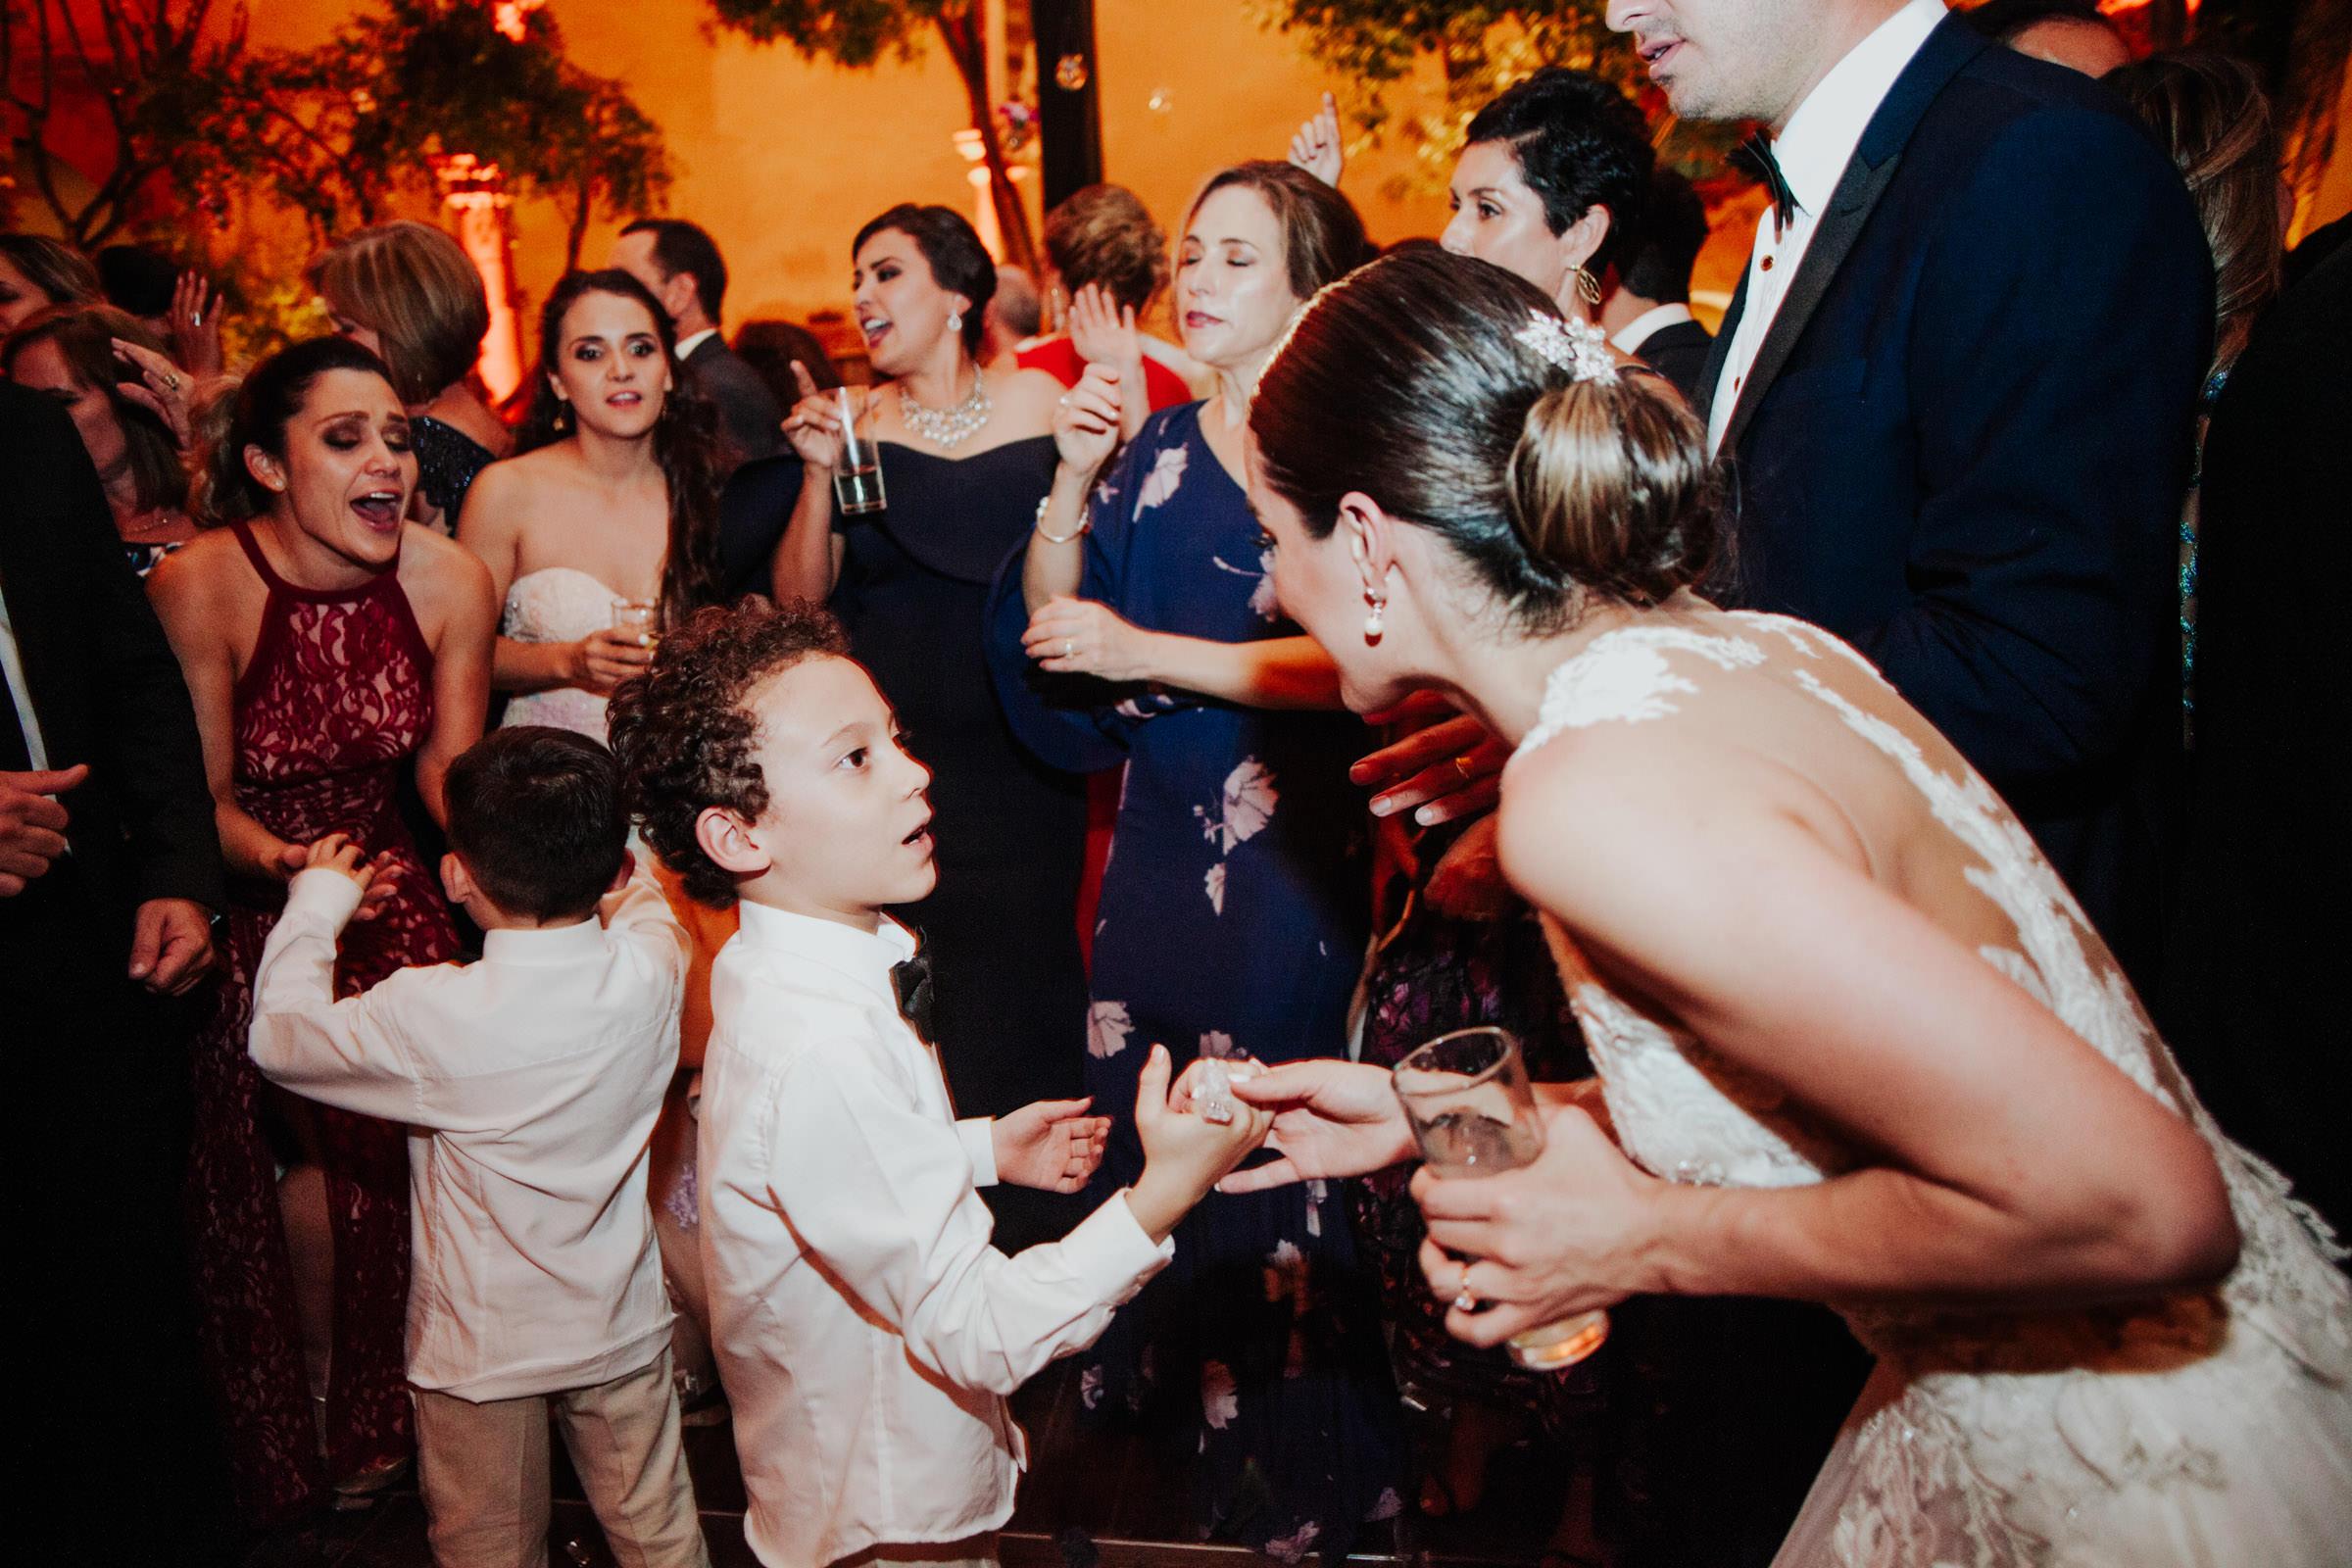 San-Miguel-de-Allende-Wedding-Photography-Parroquia-Instituto-Boda-Fotografia-Fer-Sergio-Pierce-Lifestyle-Photography0053.JPG